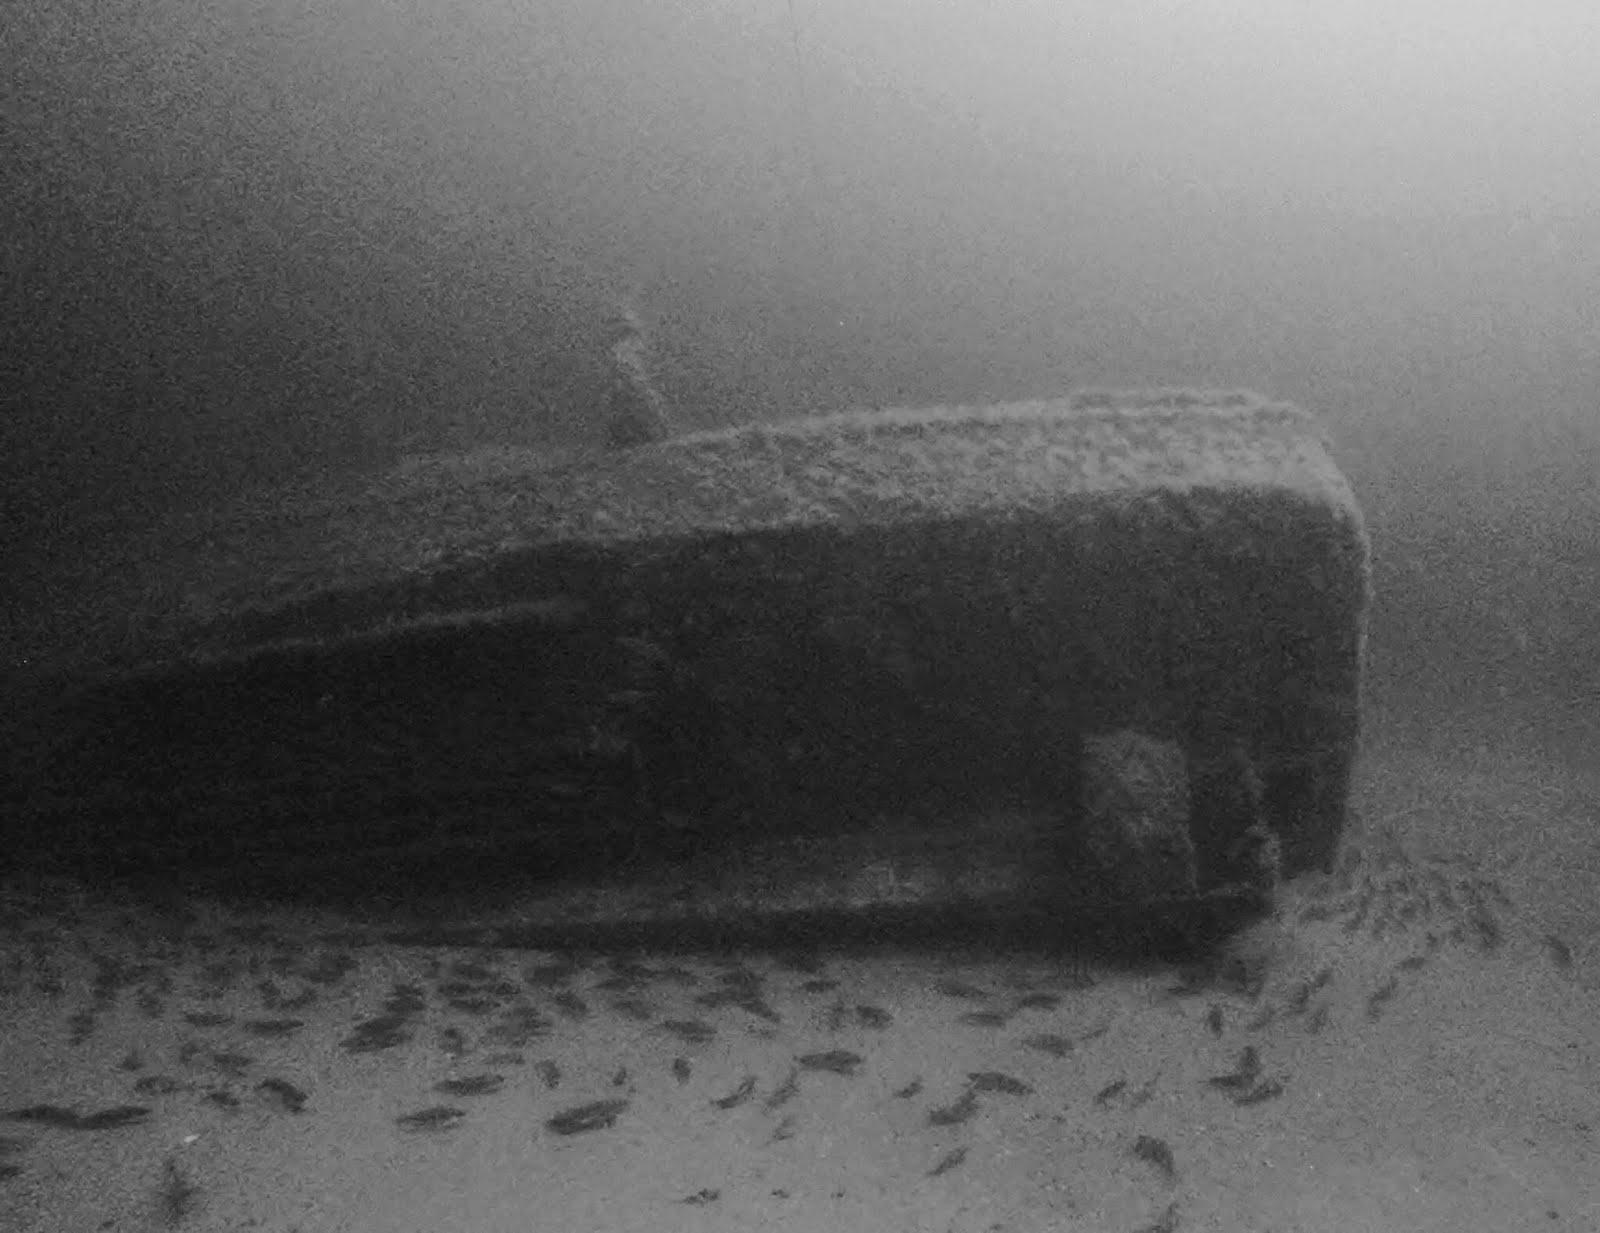 FV Patriot sunk on Stellwagen Bank